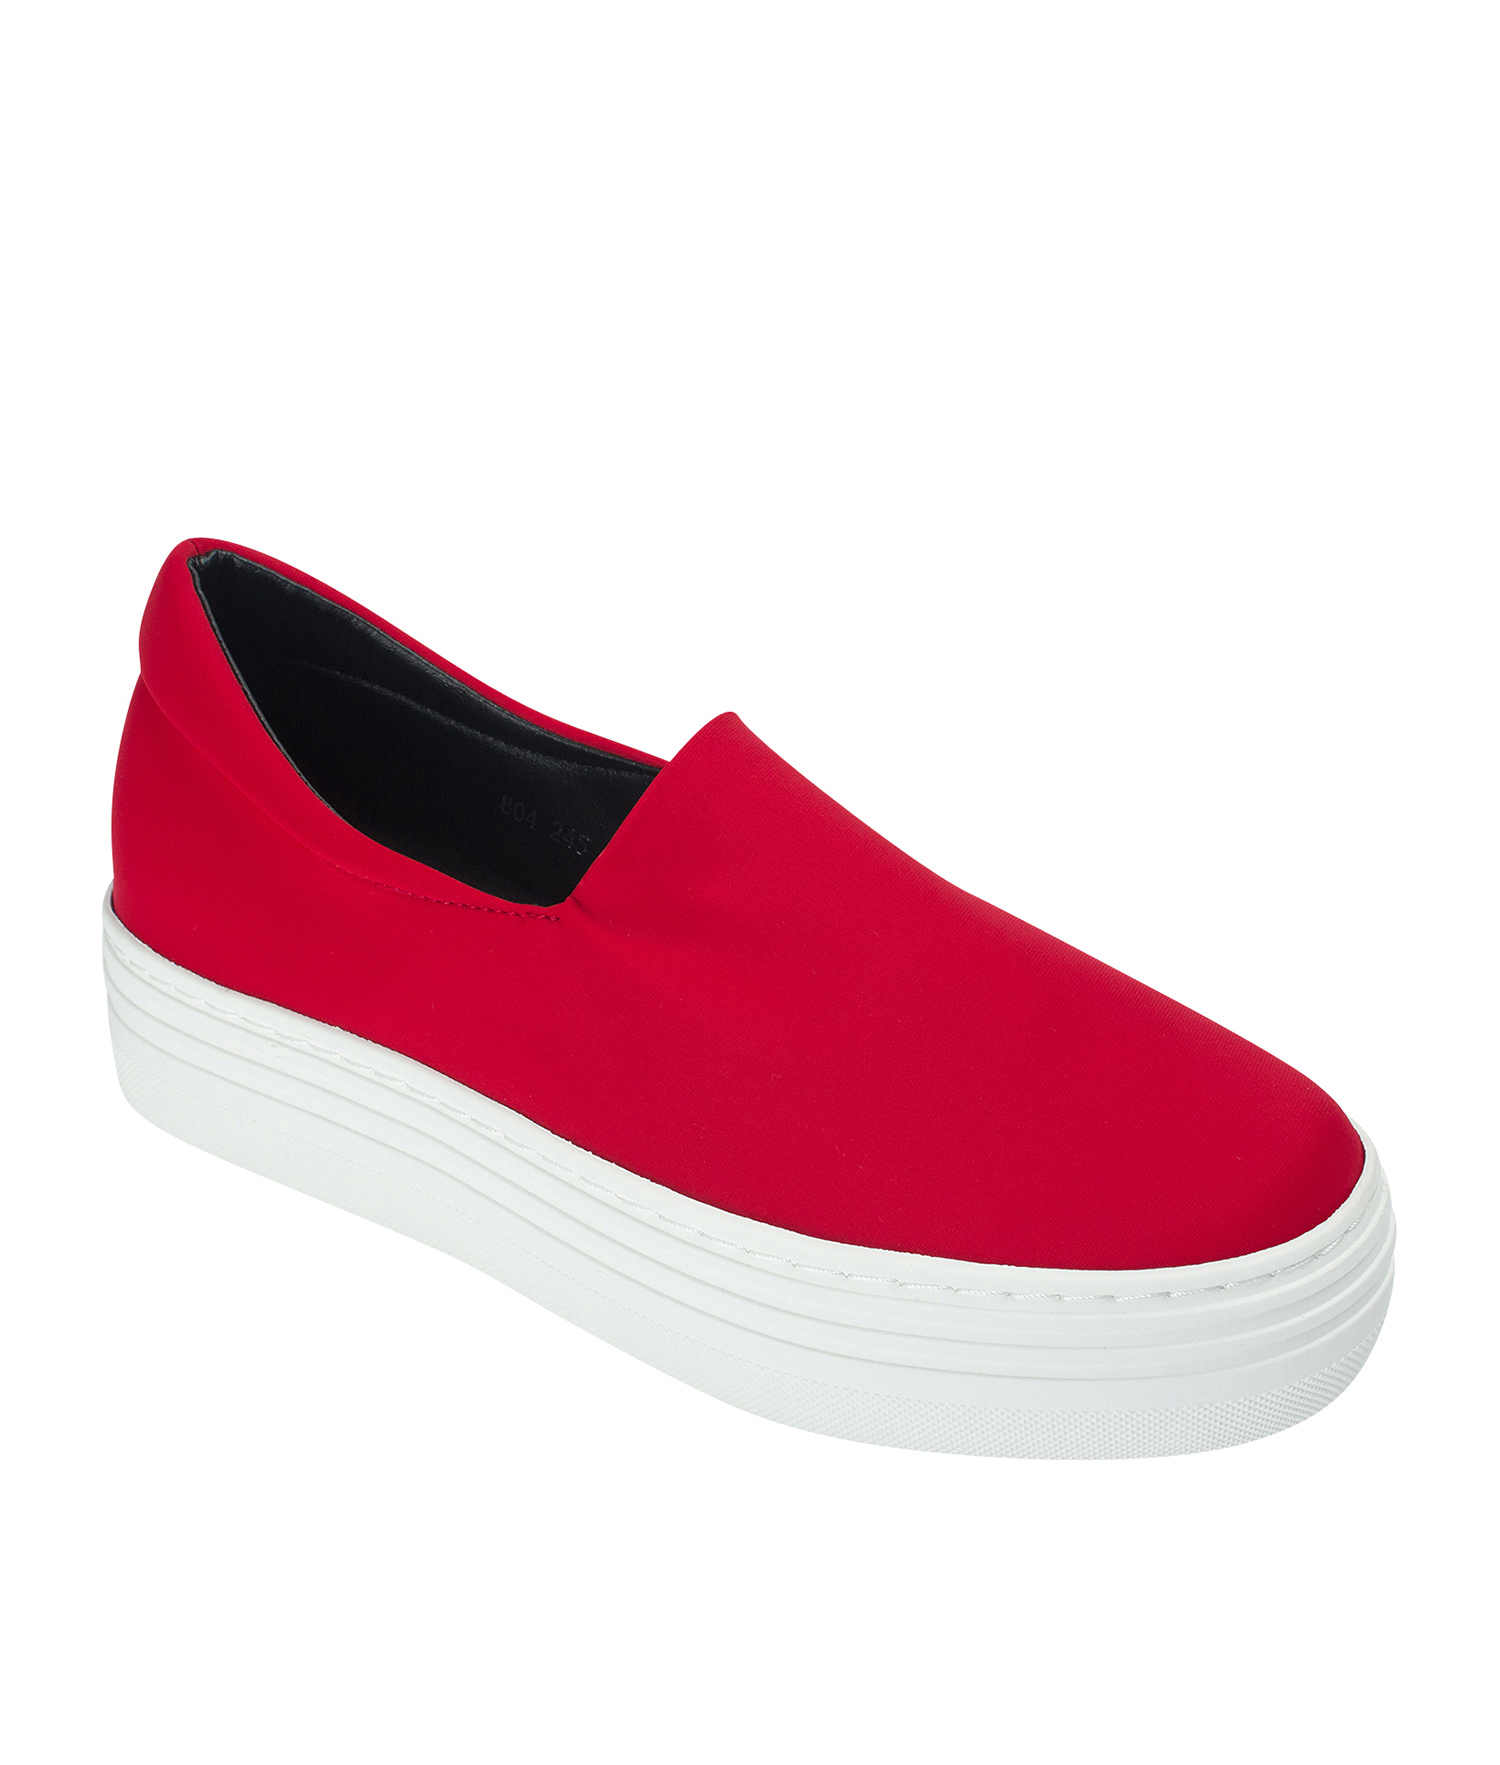 d11350187ef Neoprene Stretch Platform Slip On Sneakers - annakastleshoes.com